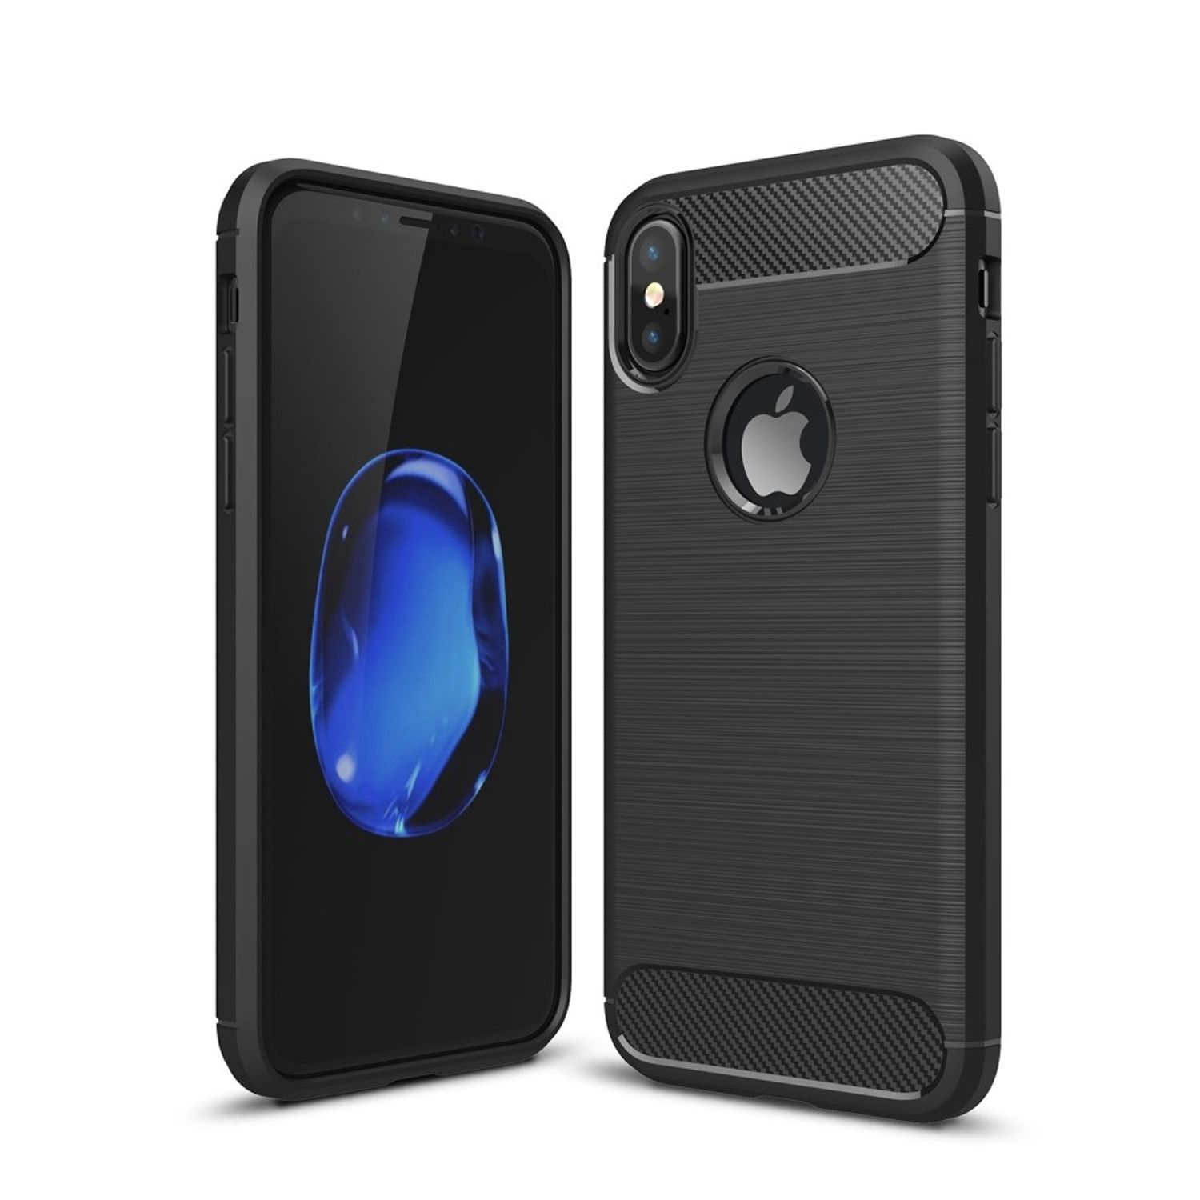 Apple iPhone XS Cover TPU Case Silikon Schutz-Hülle Handy Bumper Carbon Optik Schwarz